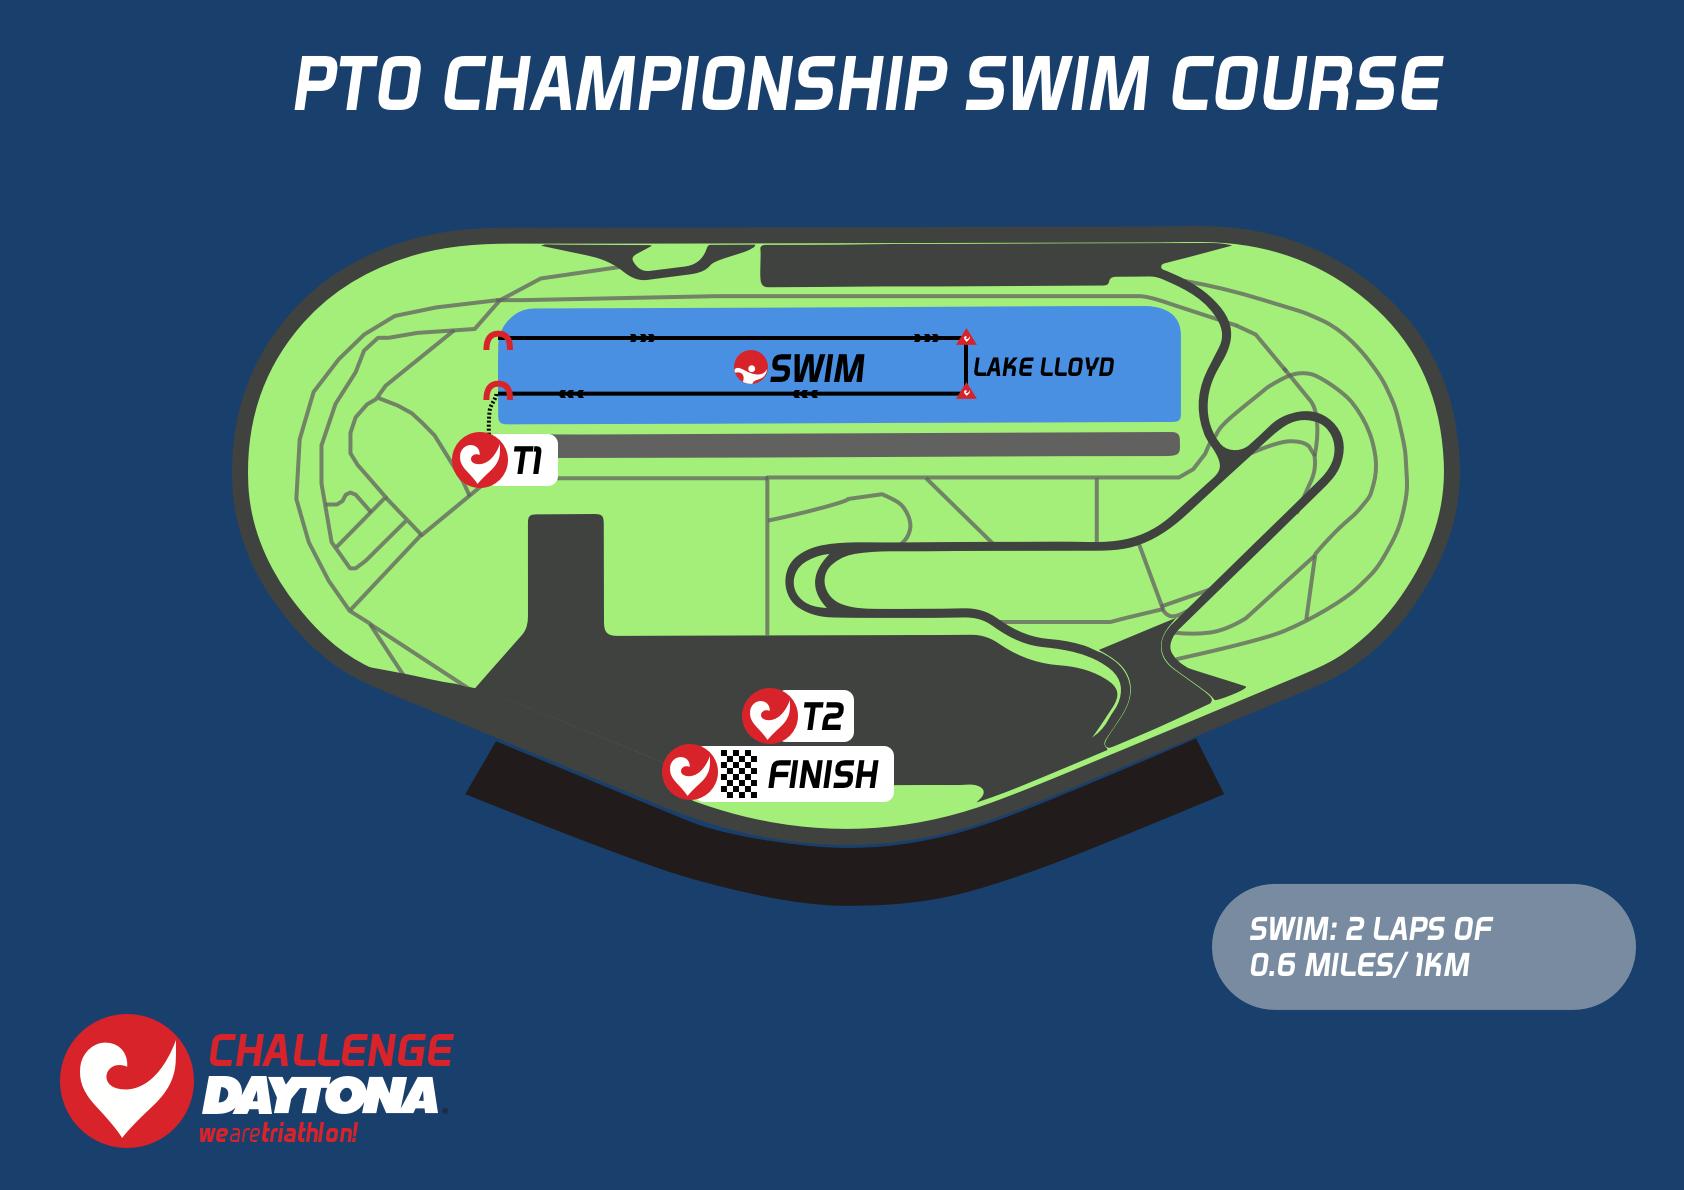 Professional Race at Challenge Daytona